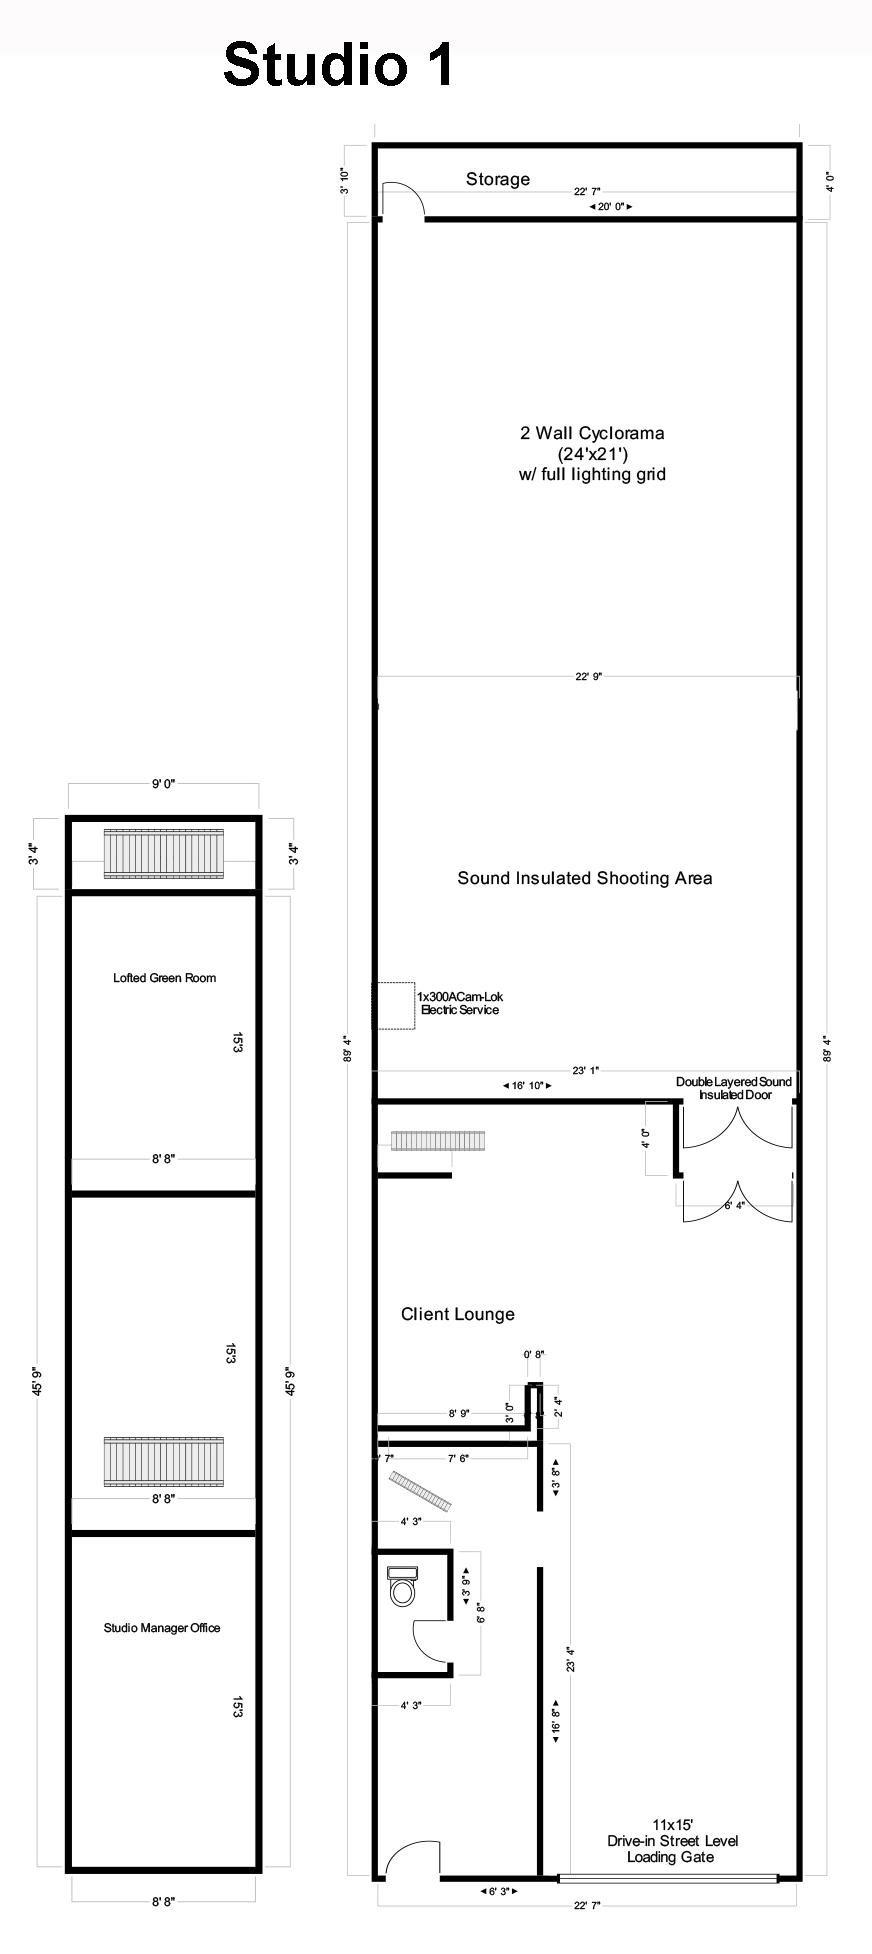 be-electric-Studio-1-Floor-Plan.jpg